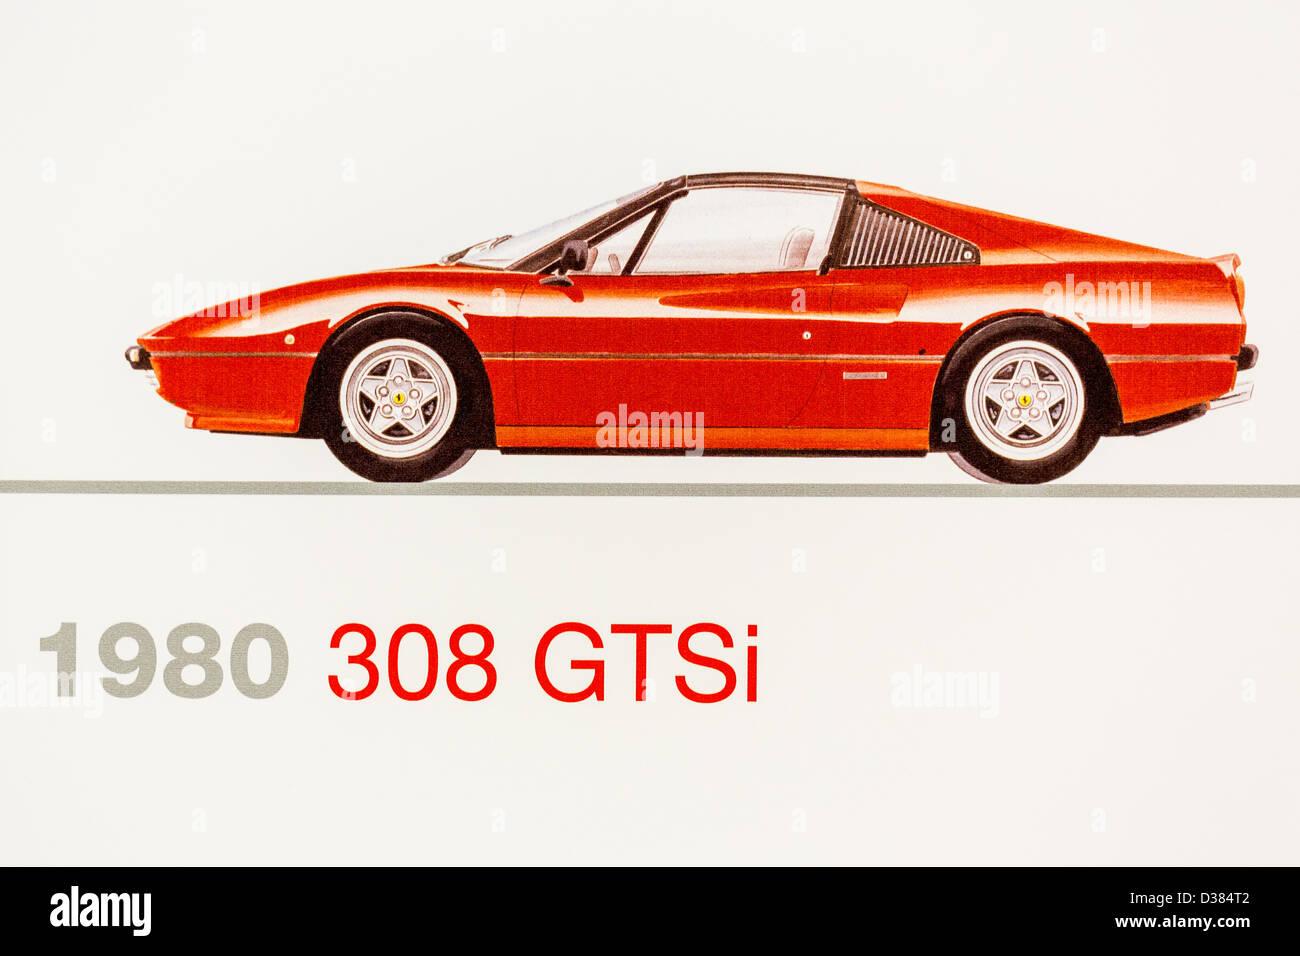 Graphic Representation Of A 1980 Ferrari 308 GTSi Ferrari